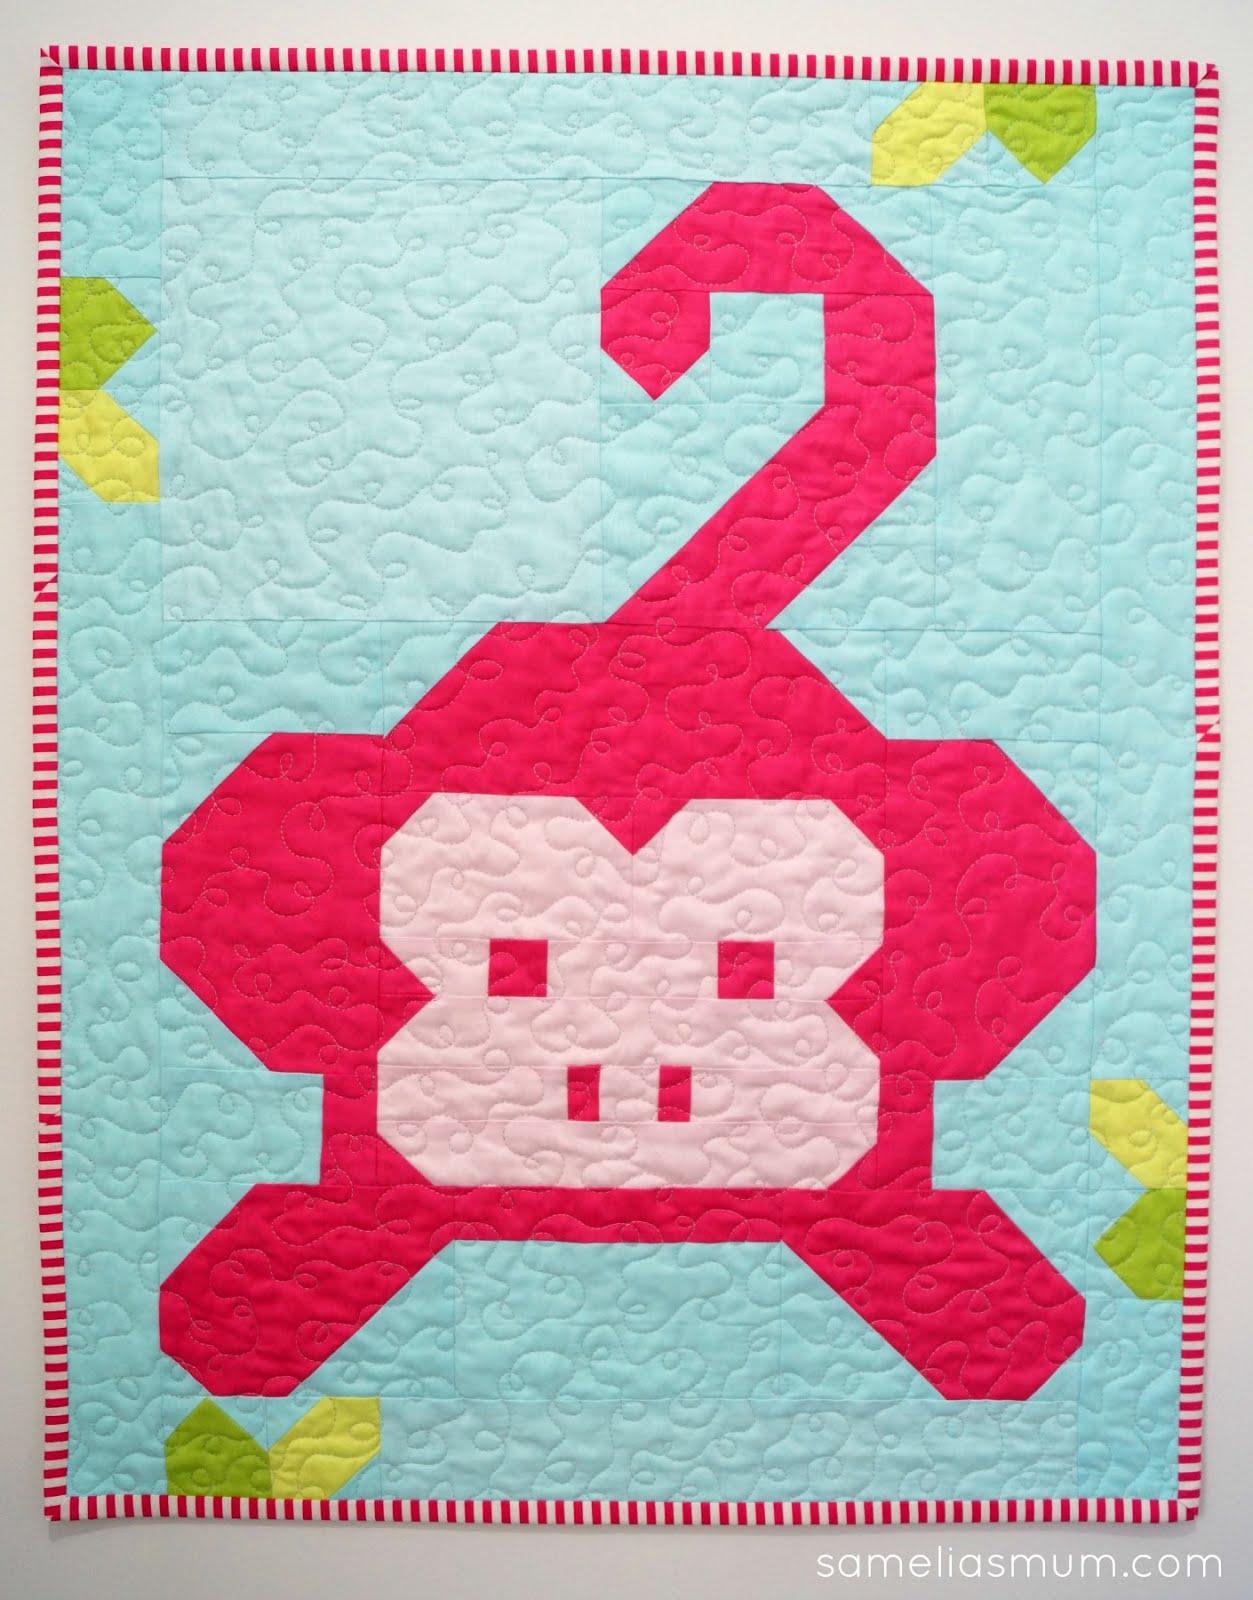 Samelia's Mum: Monkey Business Quilt : monkey business quilt pattern - Adamdwight.com